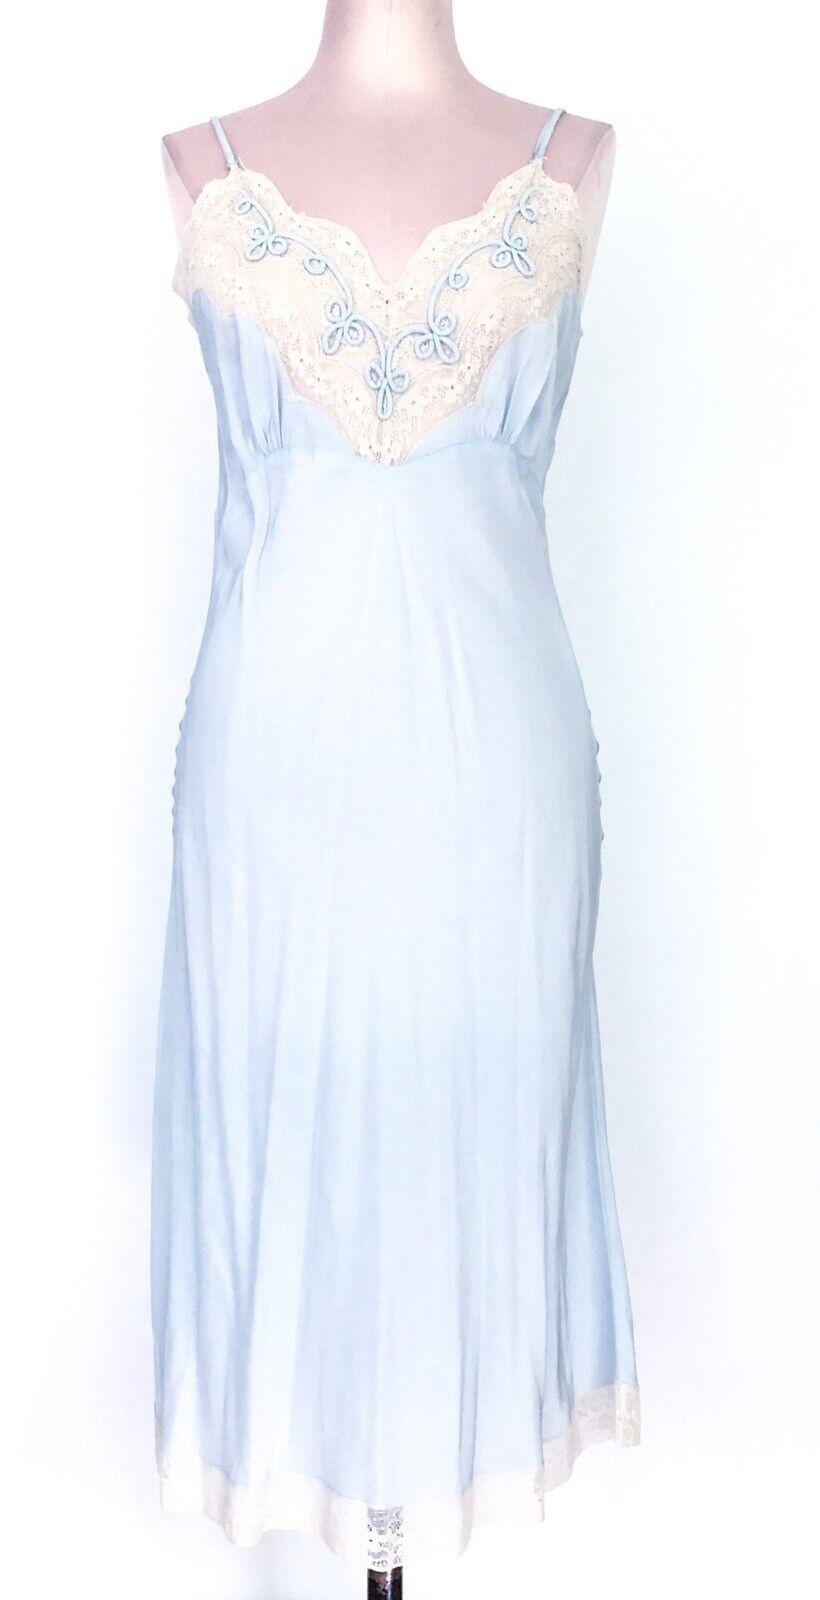 Vintage Light Blue Slip Dress M Slip W/ Lace Trim Sultry Slip Dress Or Lingerie